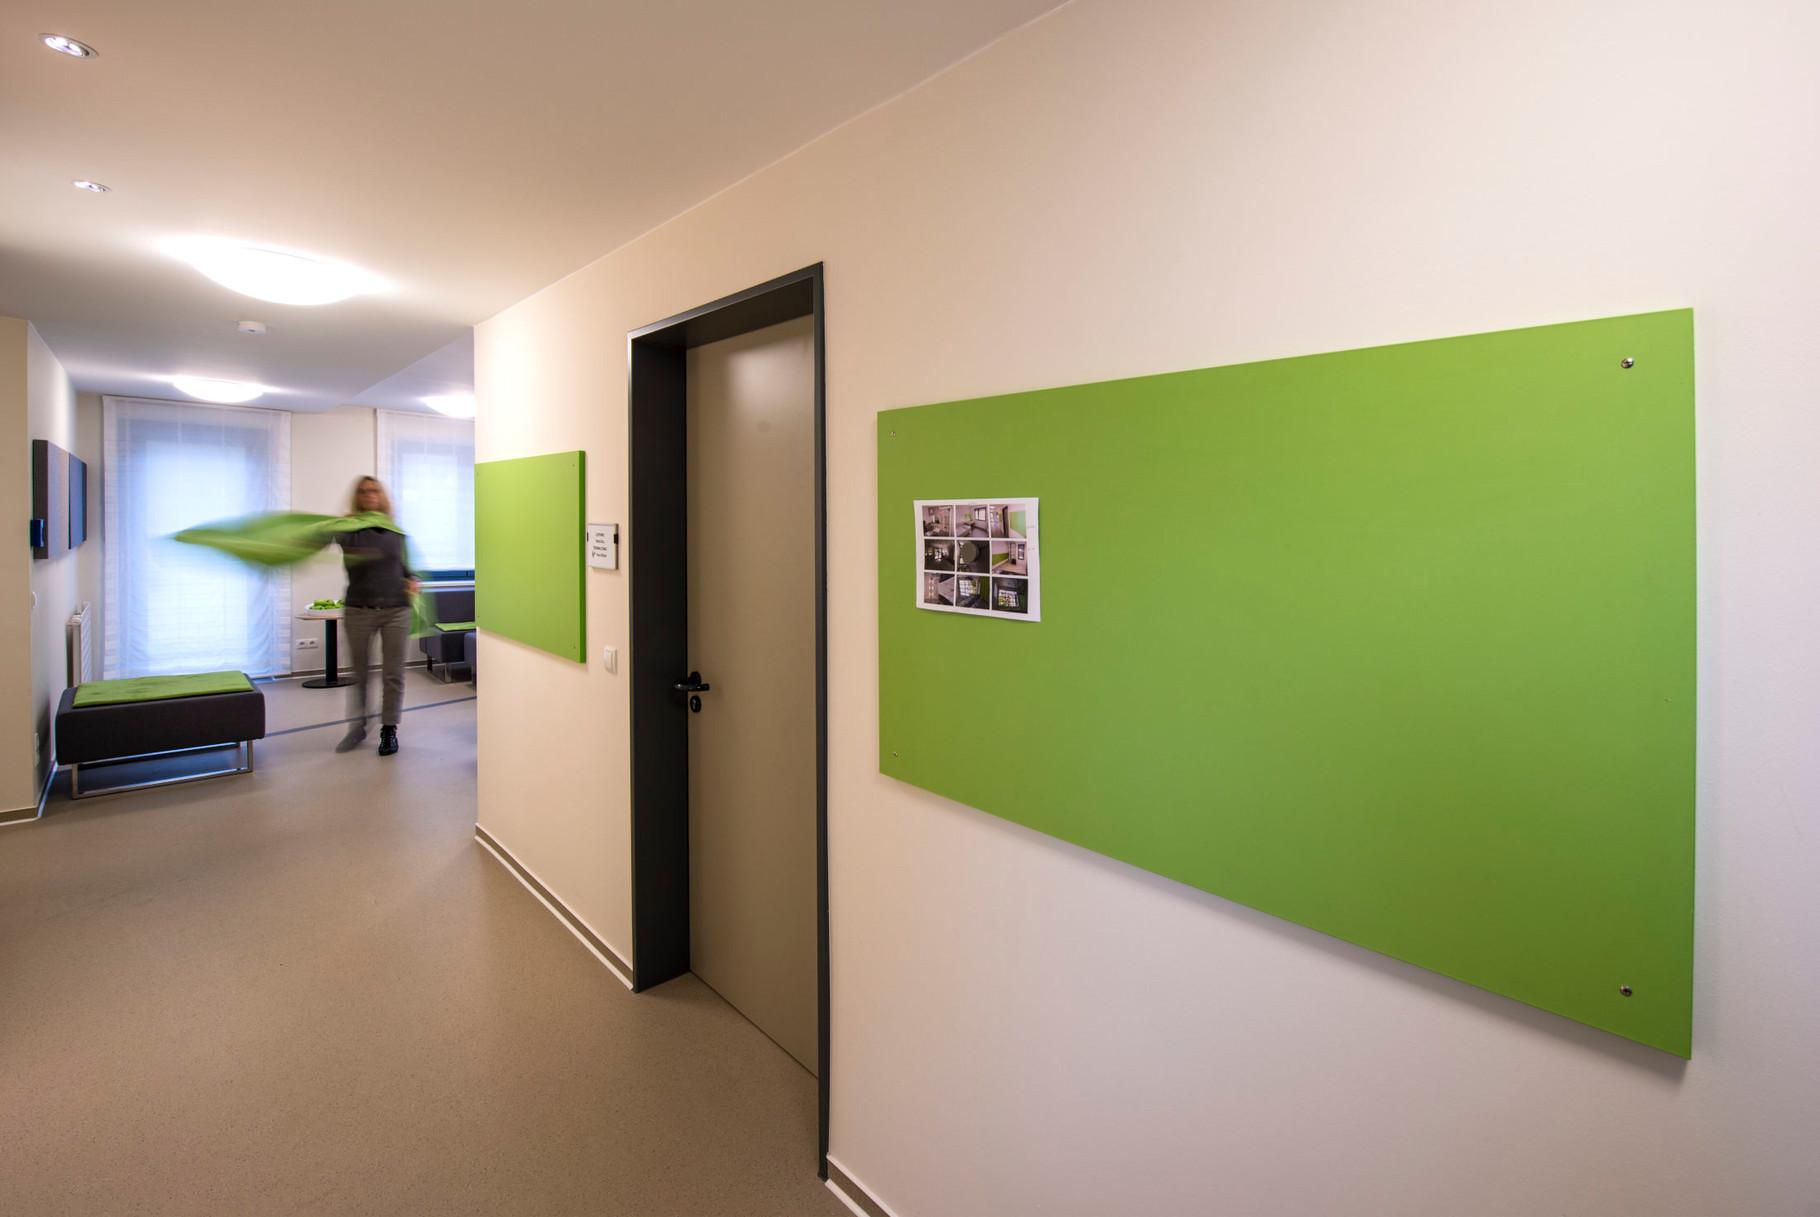 Interieurfotografie Karlsruhe Architekturfotos Rastatt Baden-Baden Bühl